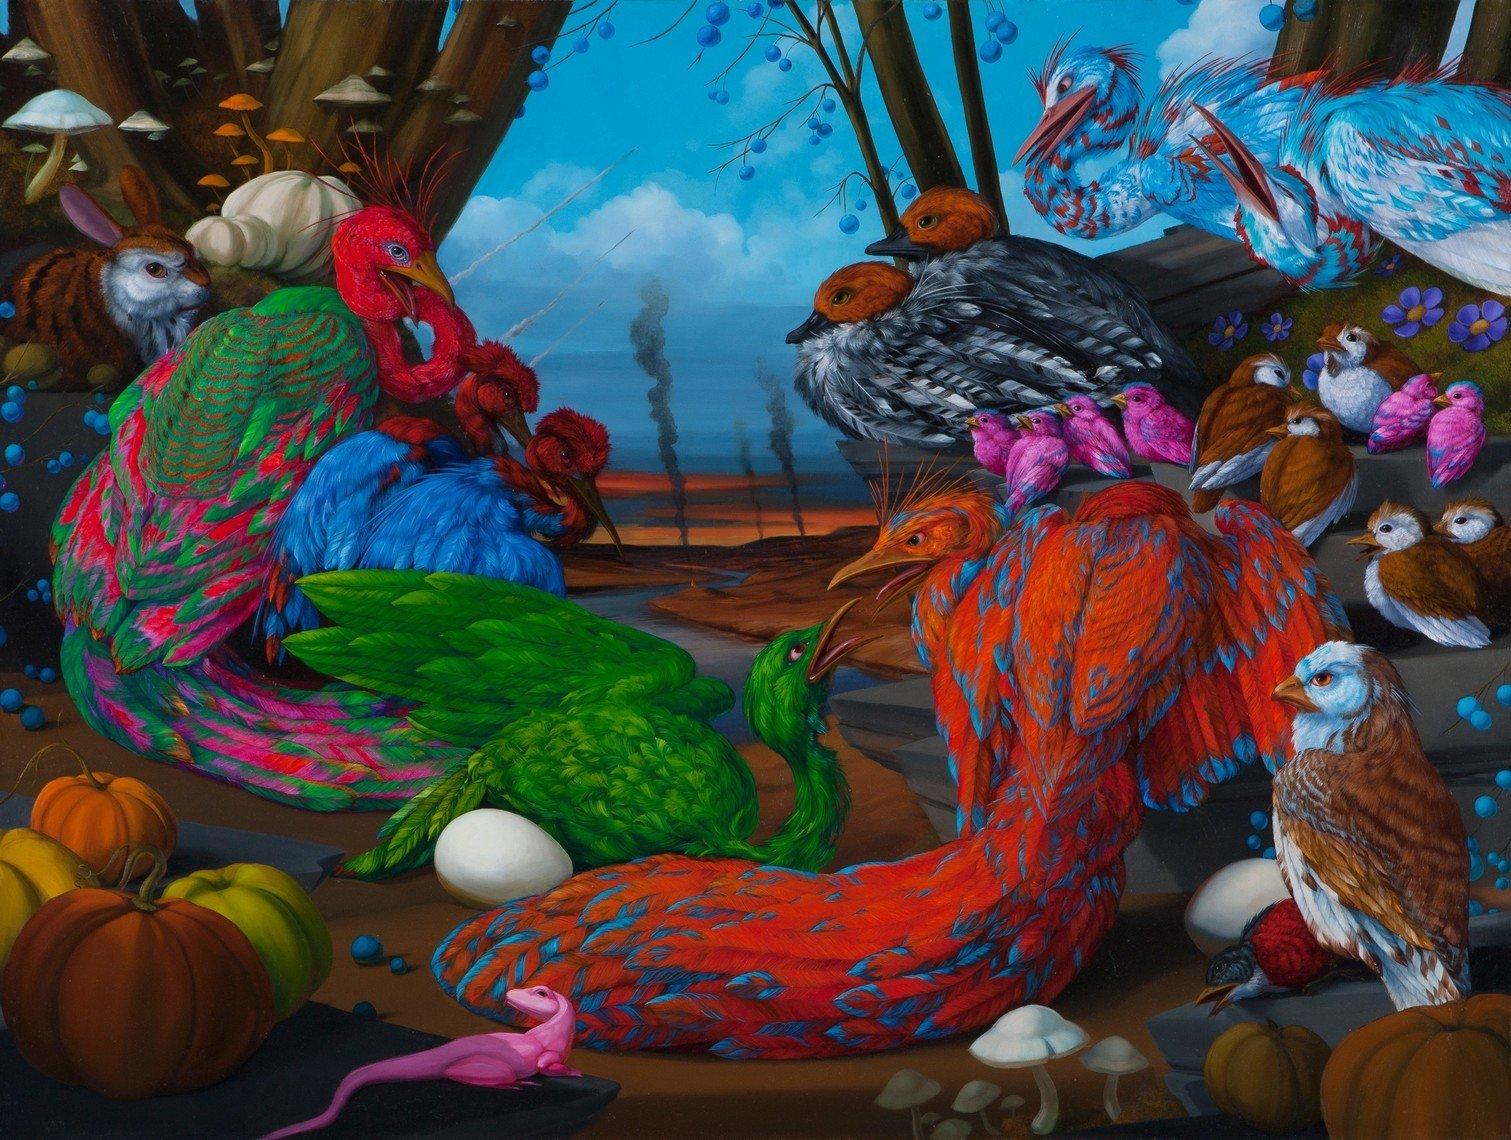 Laurie Hogin - Habitat Diorama